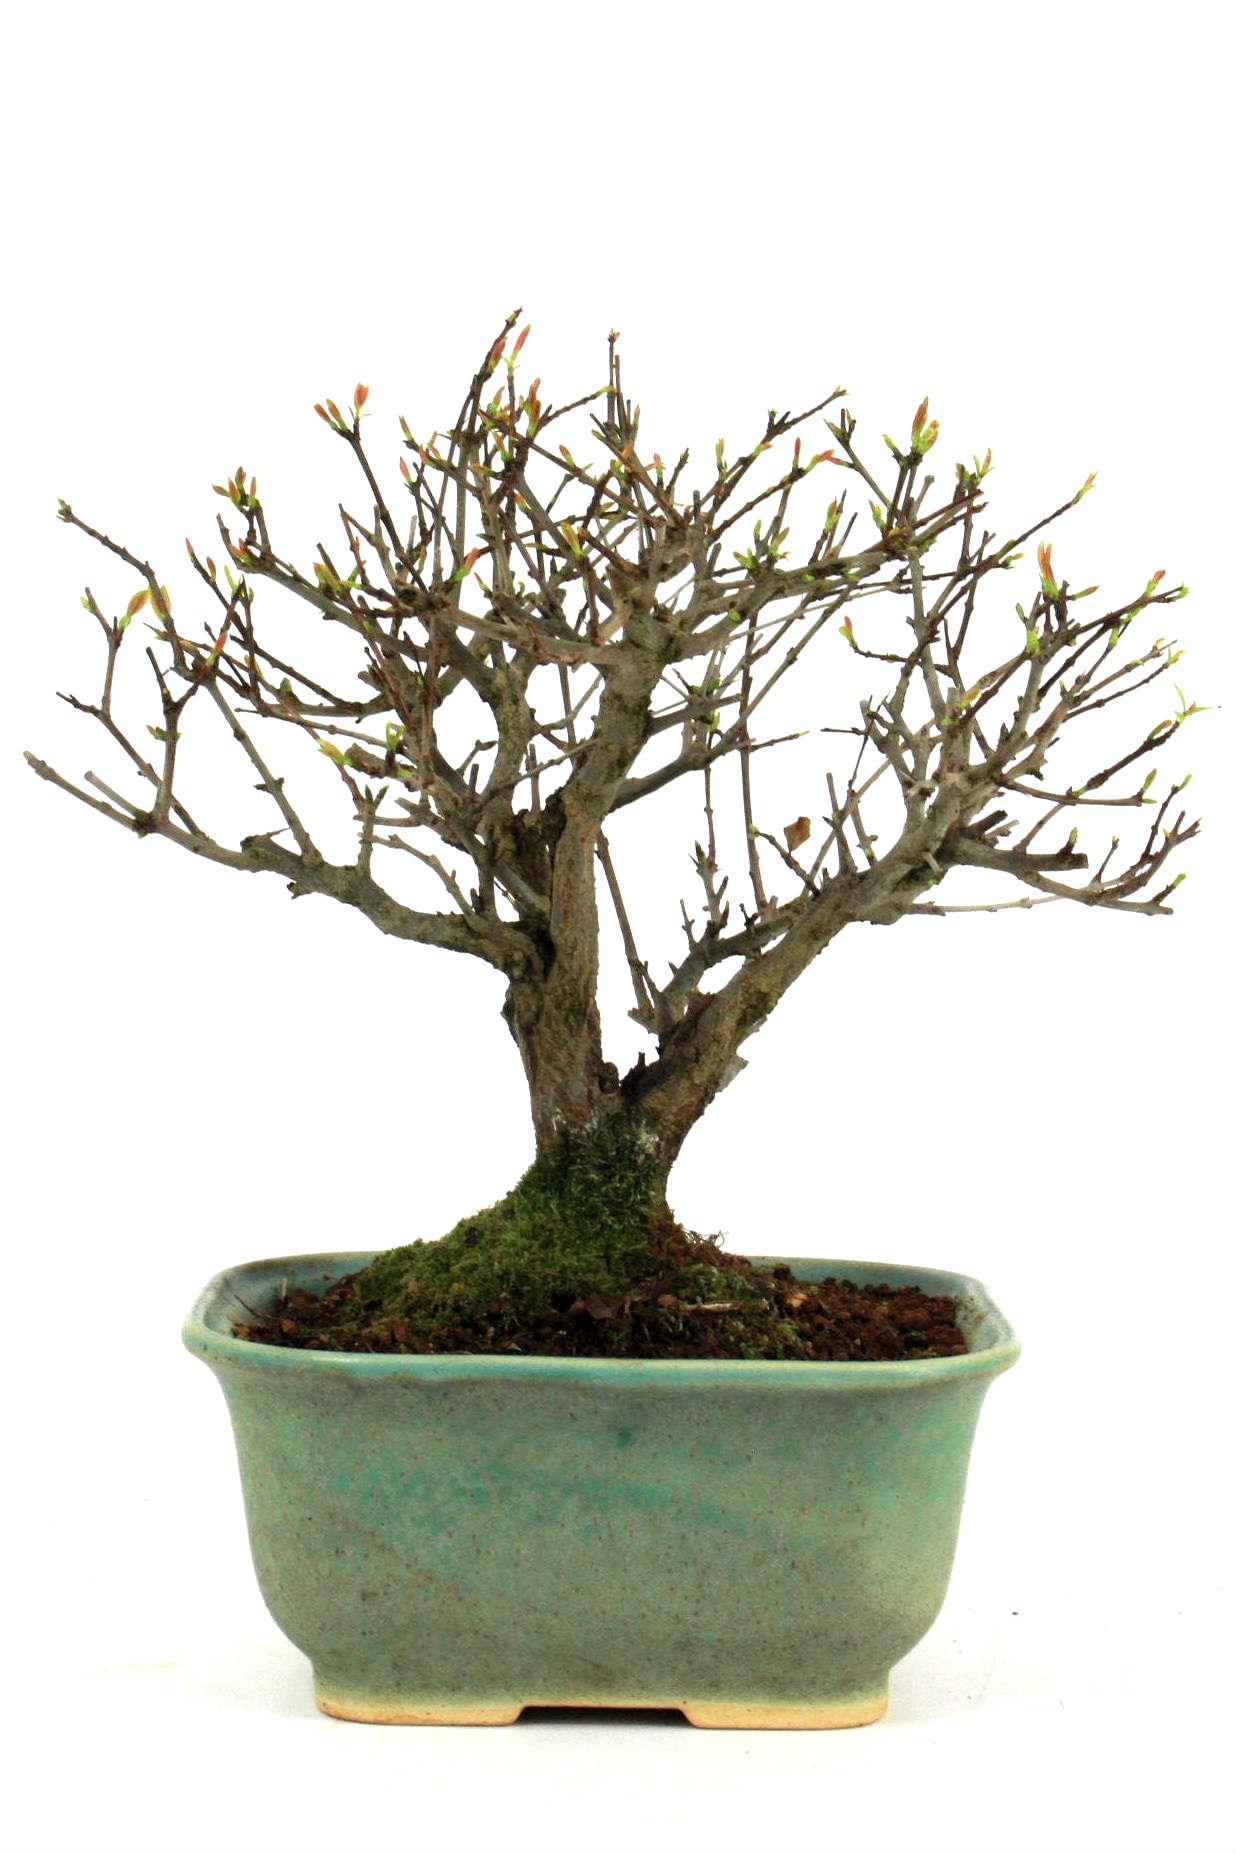 granatapfel 28 cm 1833 bei oyaki bonsai kaufen. Black Bedroom Furniture Sets. Home Design Ideas